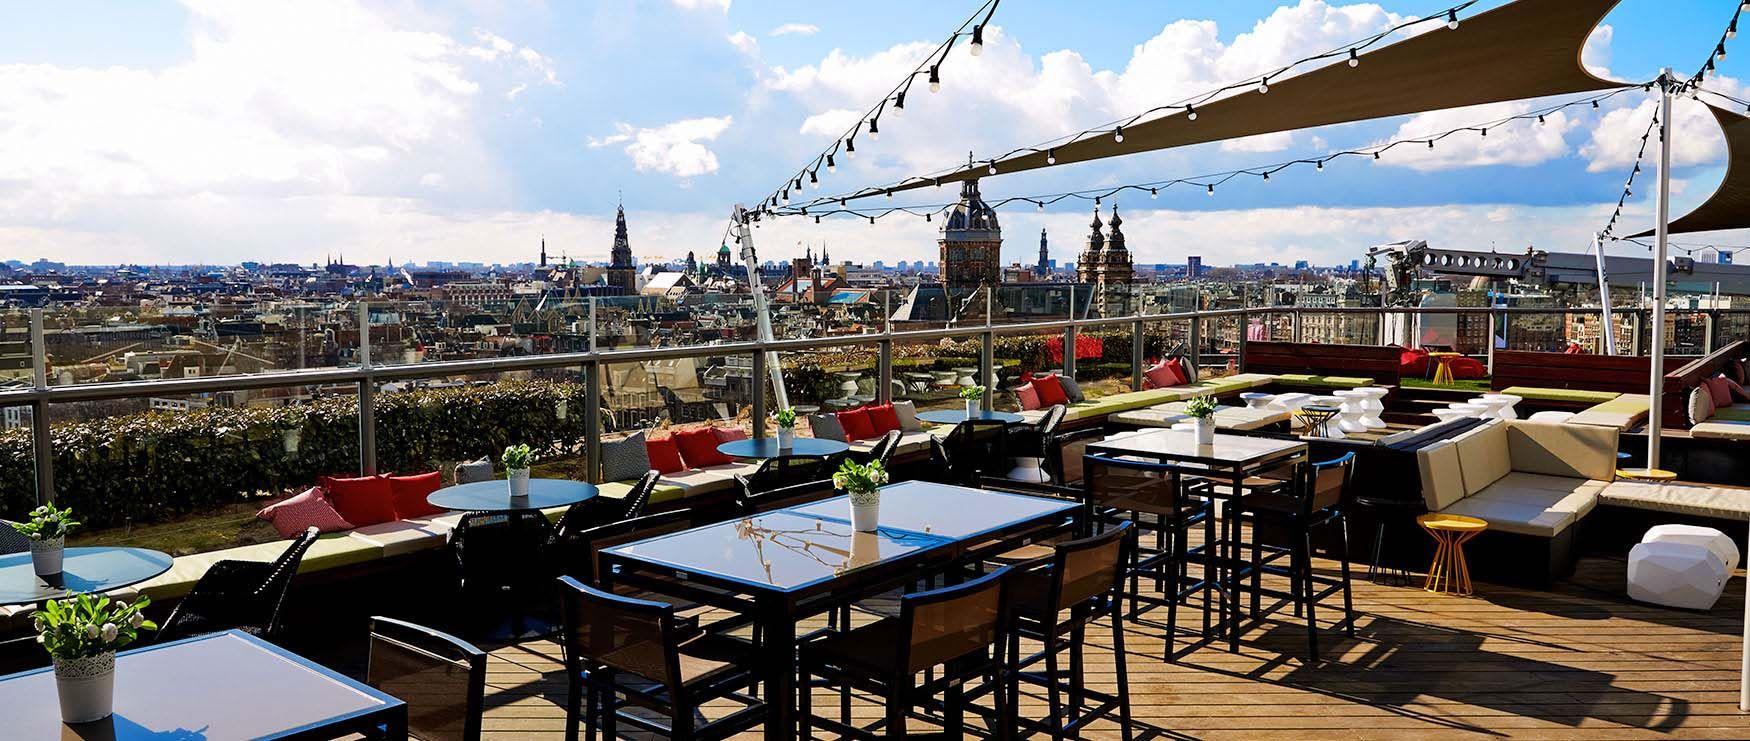 Skylounge Amsterdam In 2020 Best Bars In Amsterdam Best Rooftop Bars Amsterdam Hotel